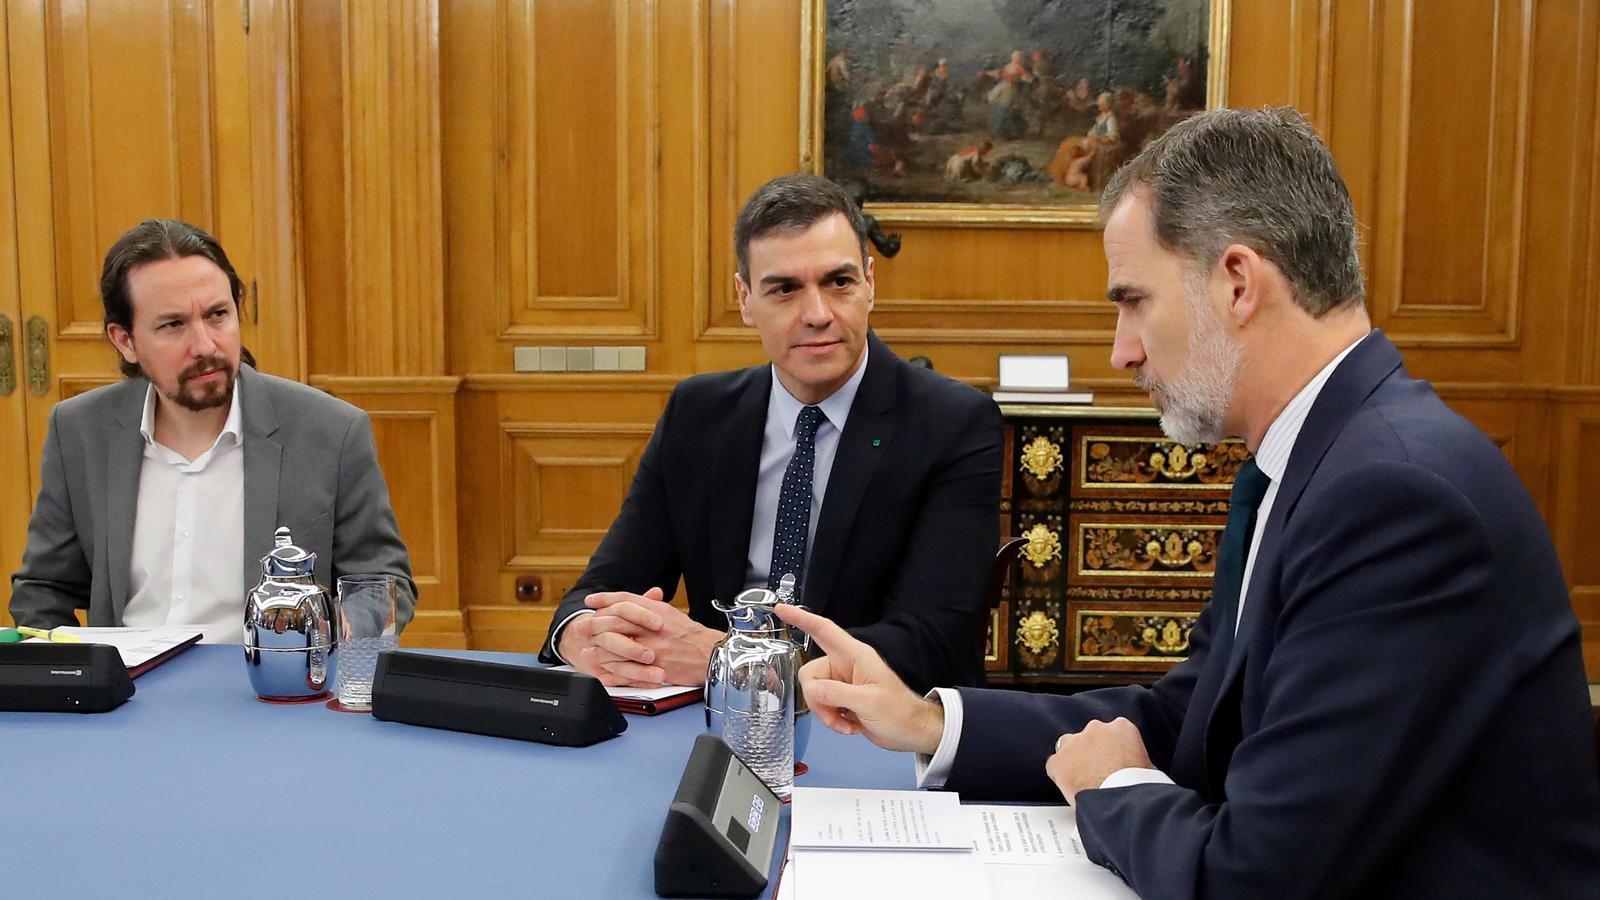 Pablo Iglesias i Pedro Sánchez, durant el consell de ministres, que avui ha presidit protocolariament Felip VI